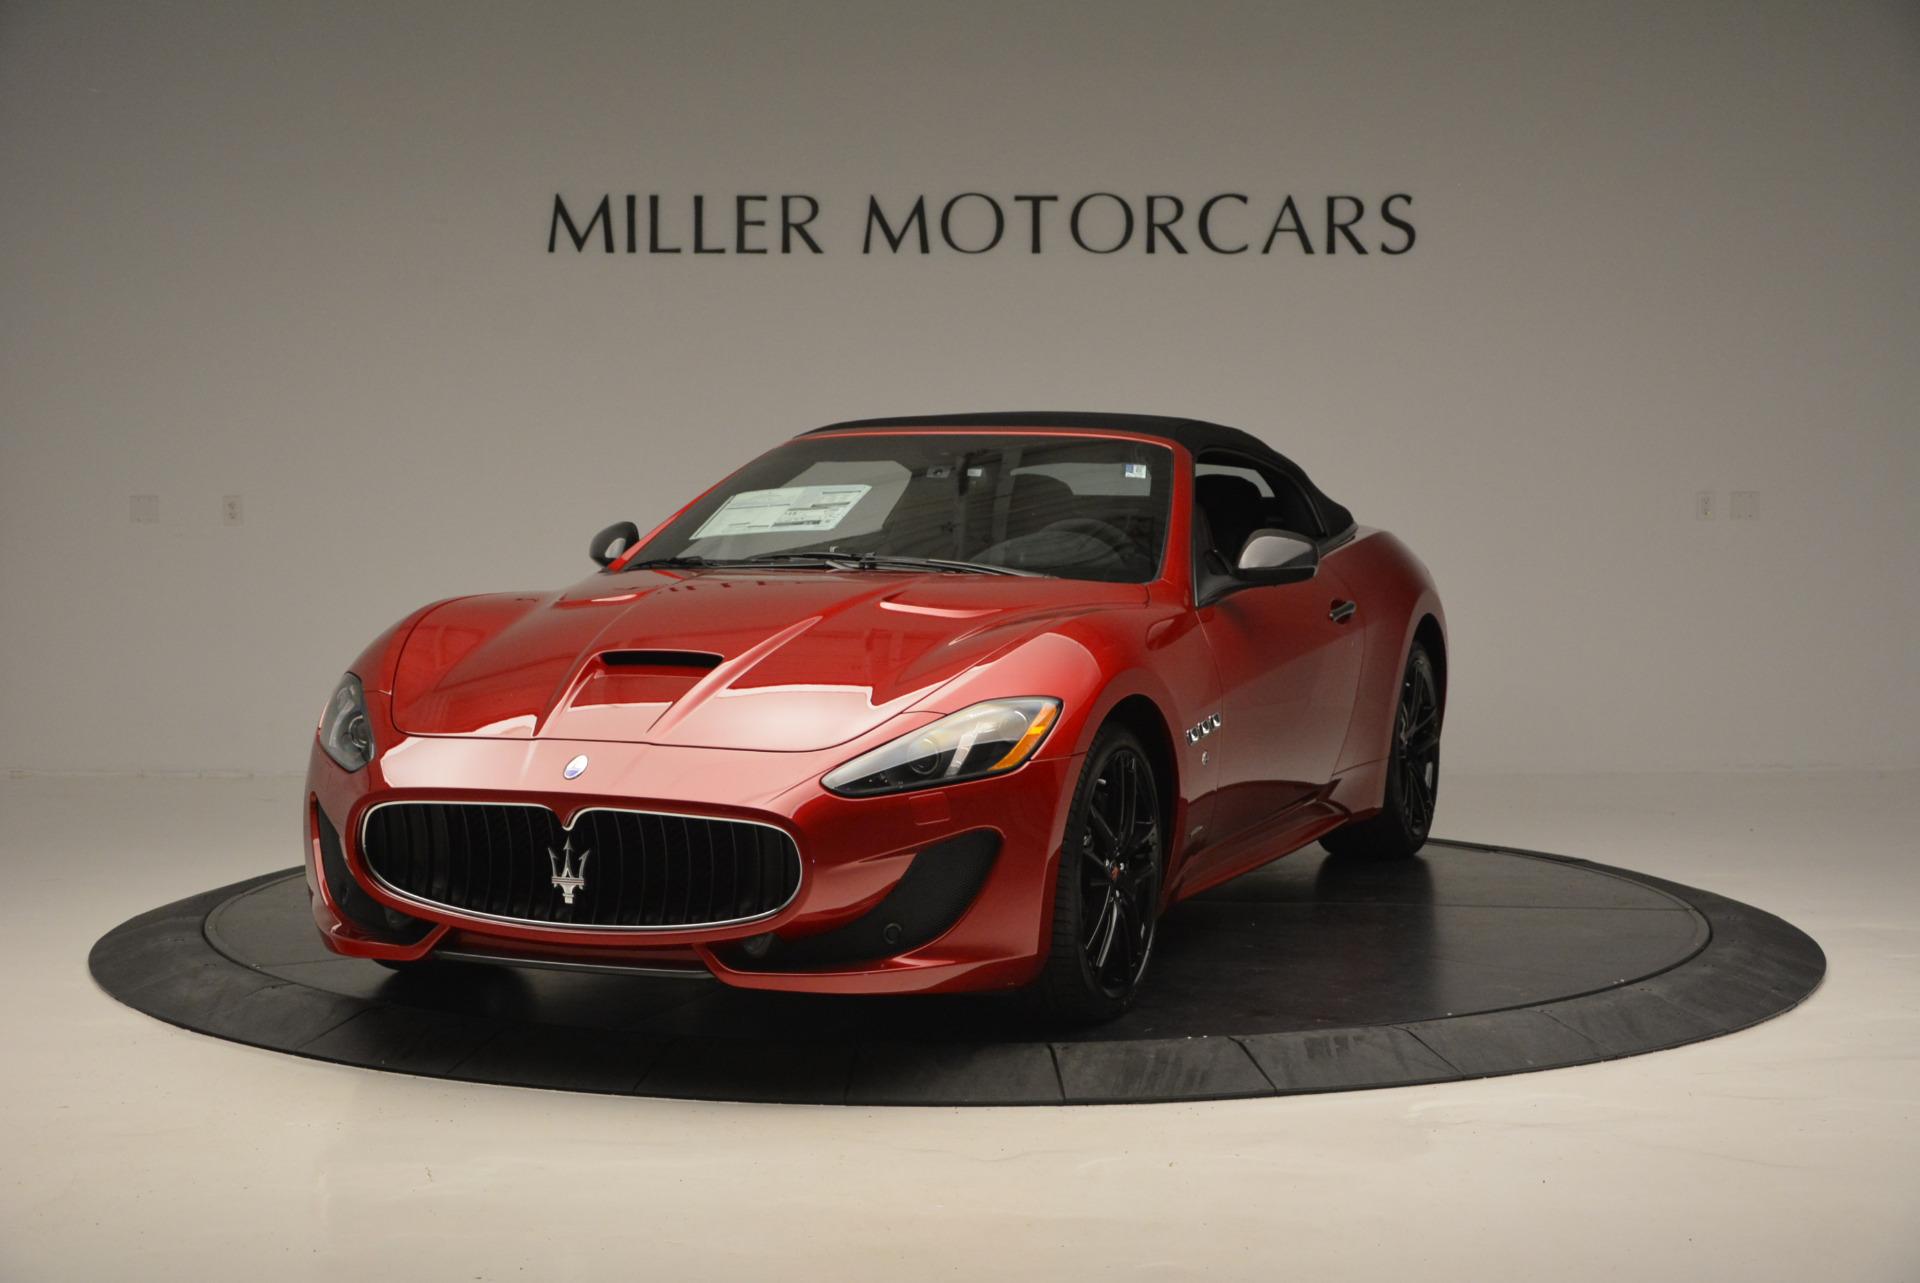 New 2017 Maserati GranTurismo Sport Special Edition For Sale In Westport, CT 666_p2